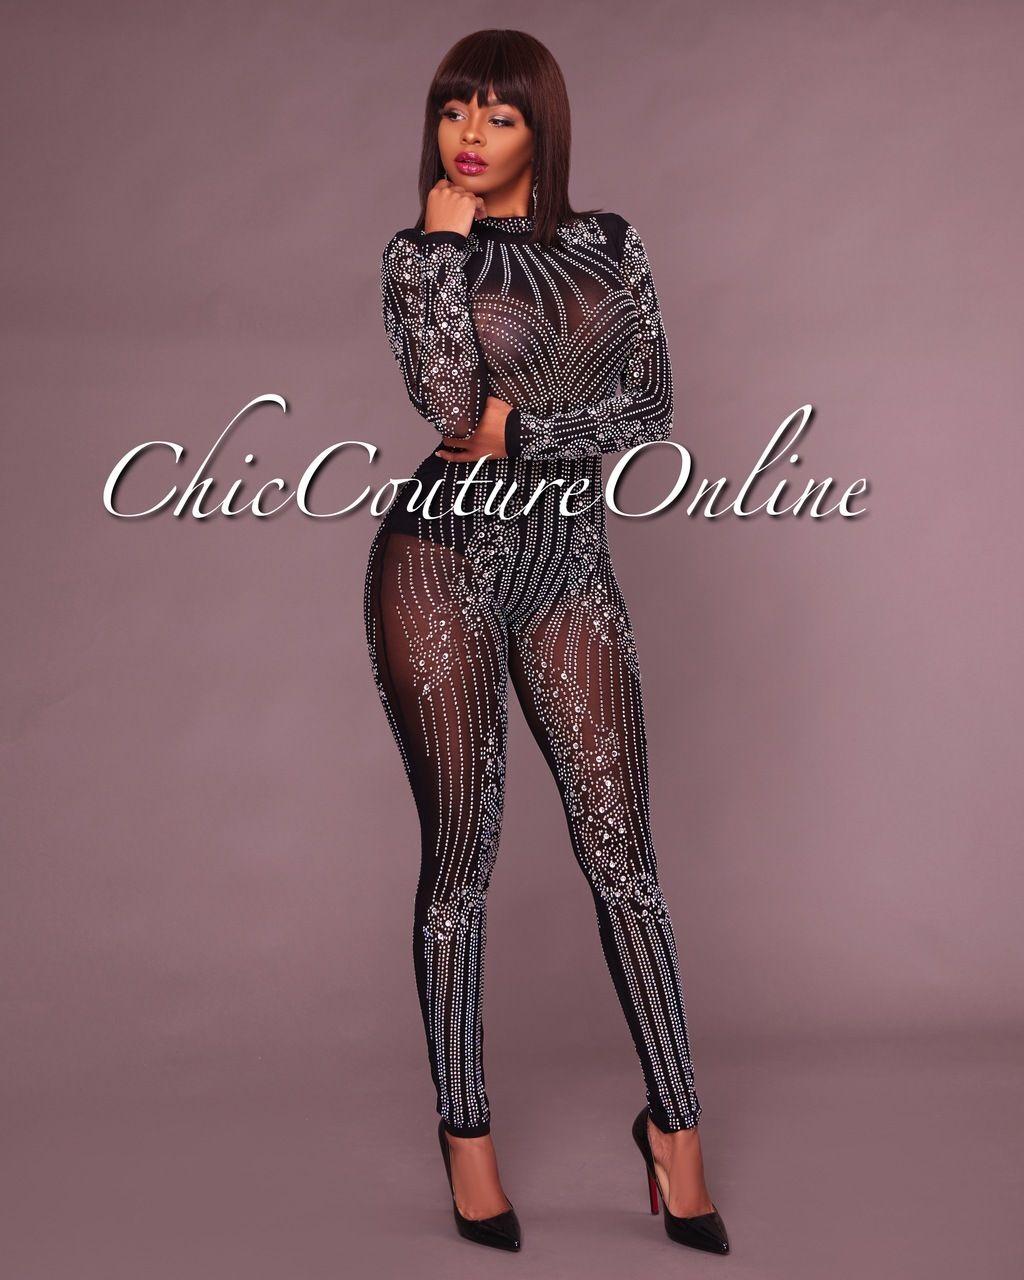 1f1bd9feb64 Chic Couture Online - Yessy Black Rhinestones Semi-Sheer Jumpsuit